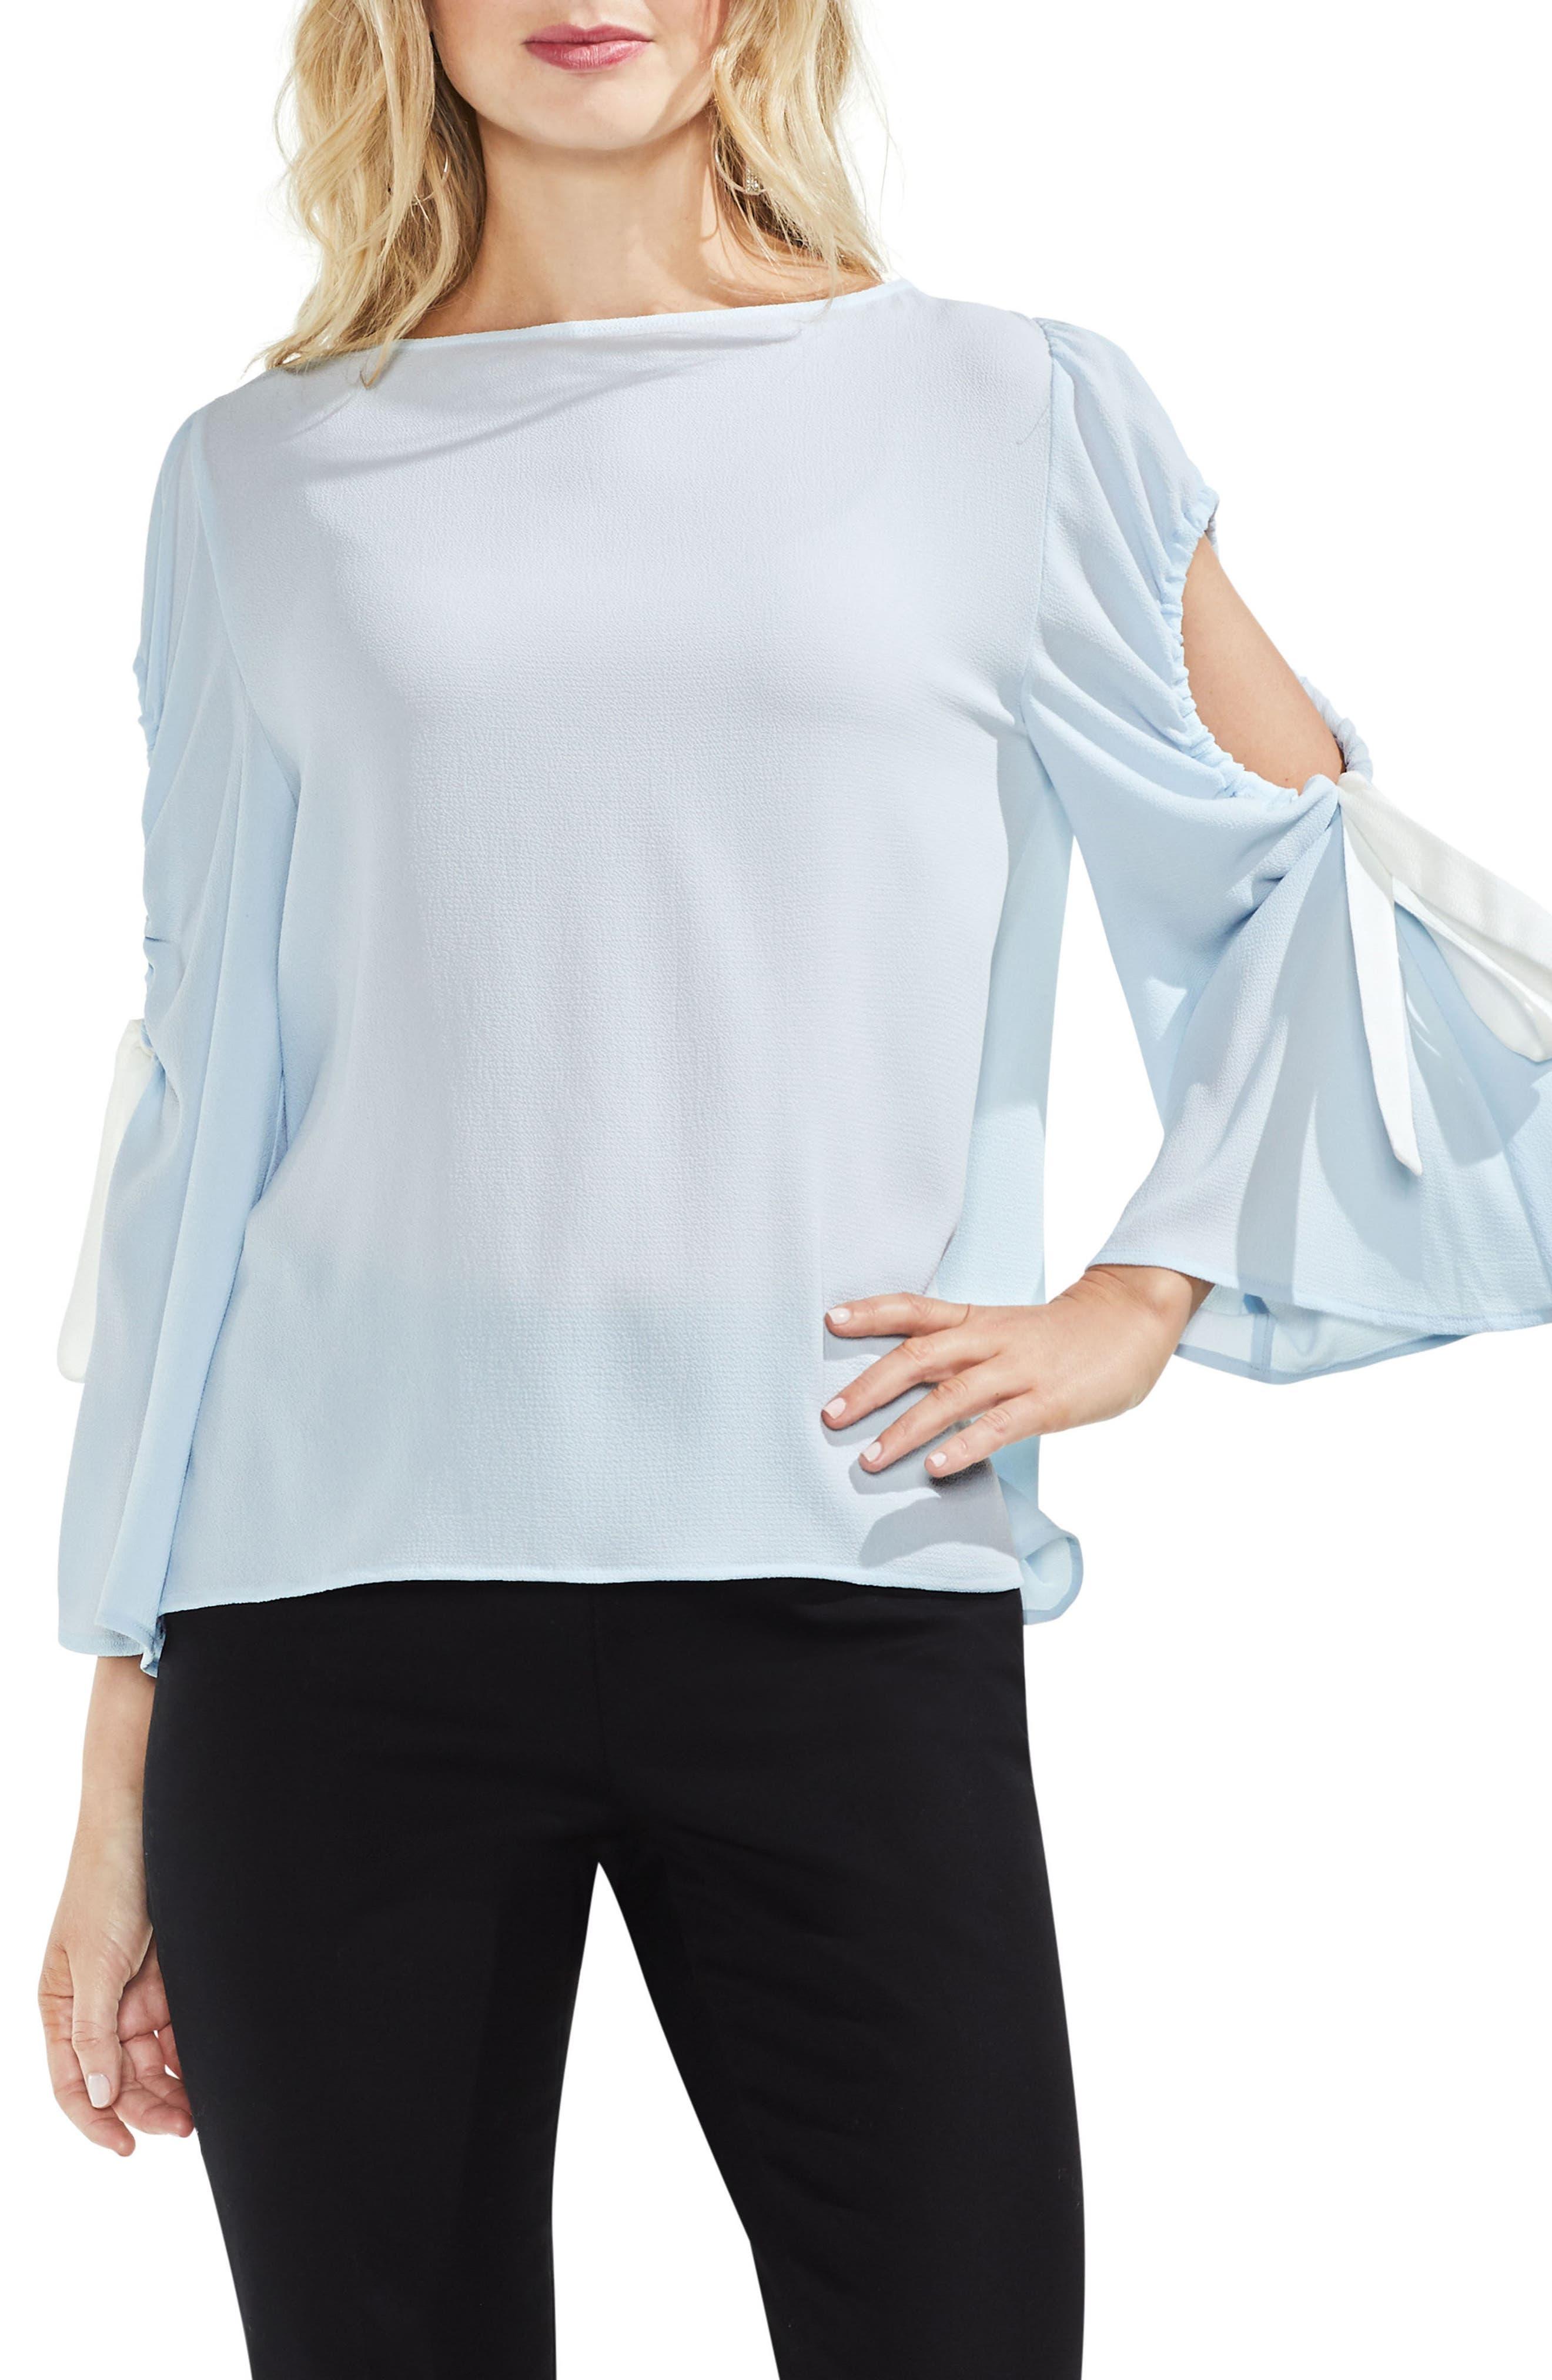 Vince Camuto Bell Sleeve Contrast Tie Cold Shoulder Top (Regular & Petite)